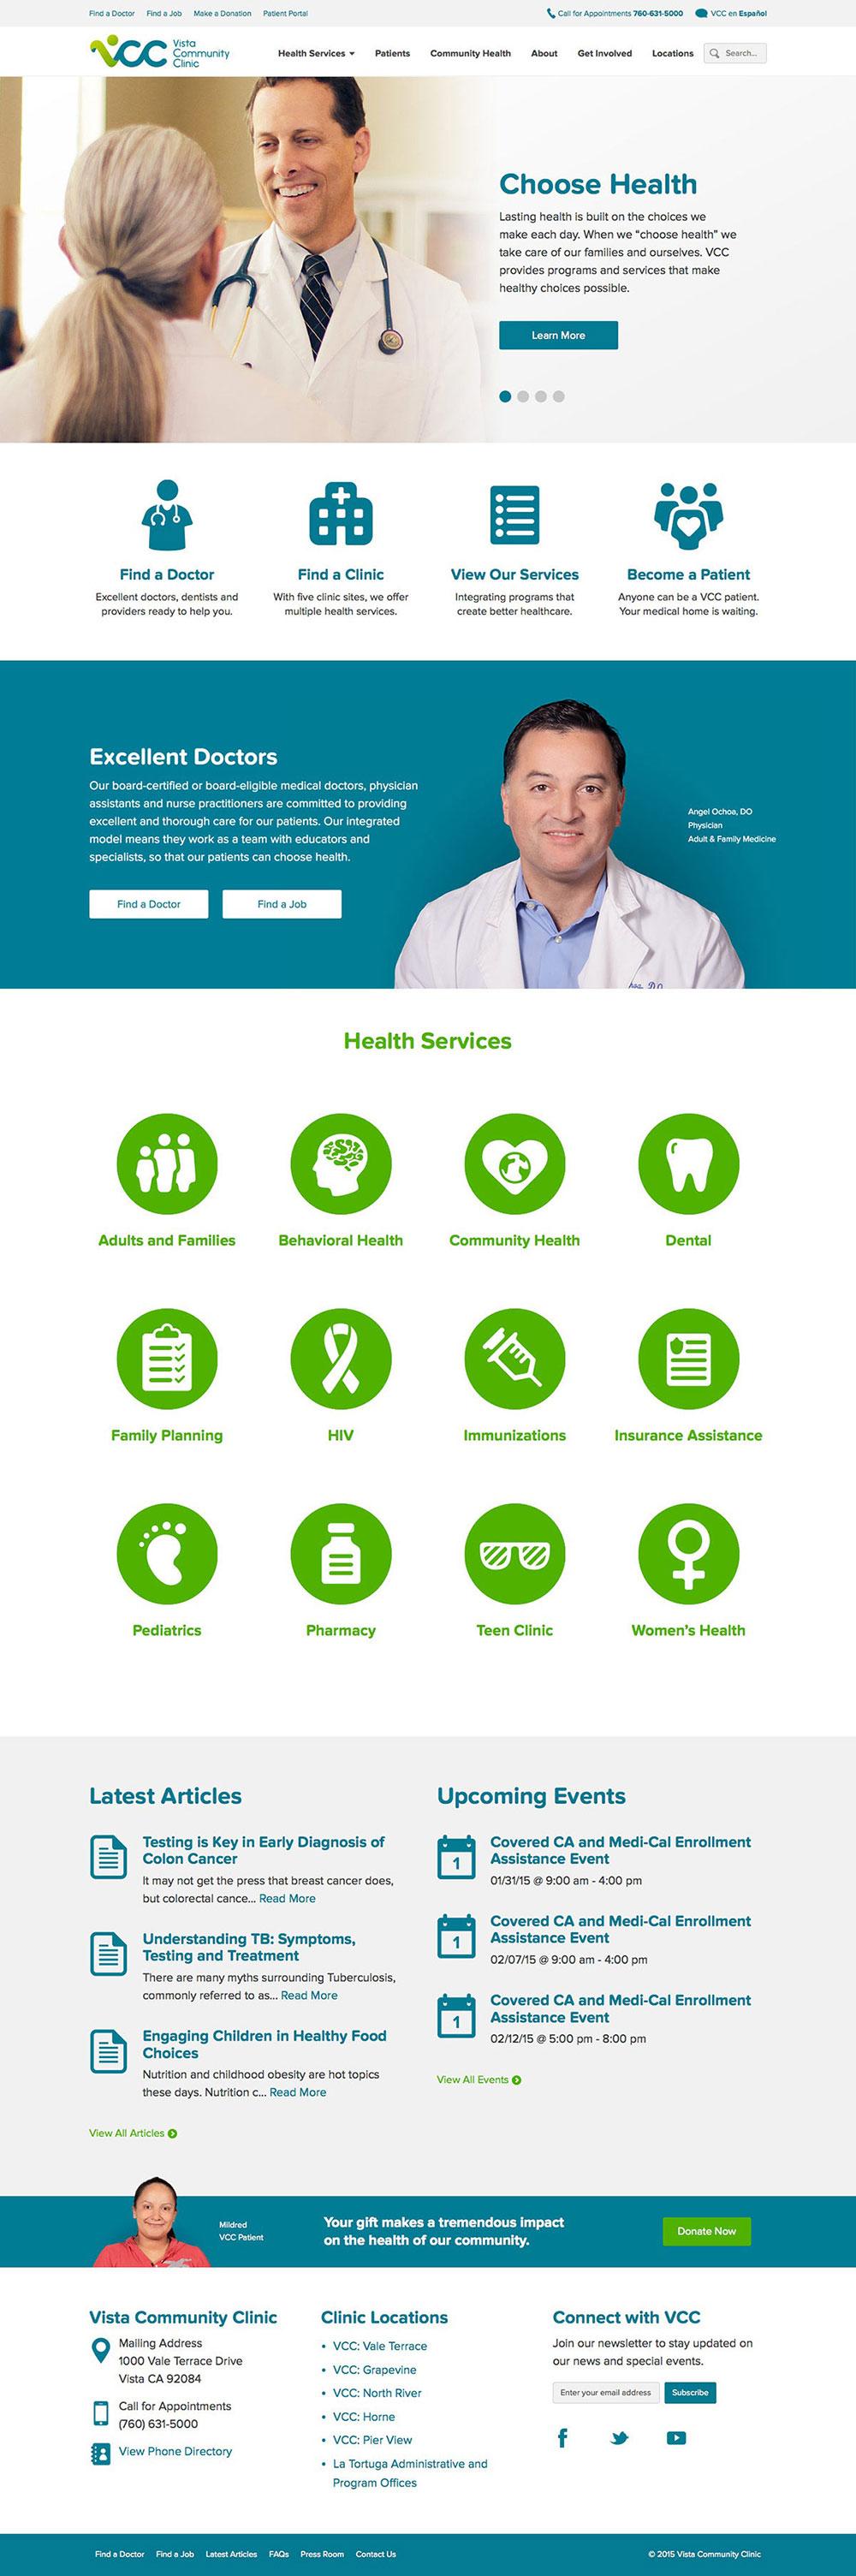 ignyte website design agency